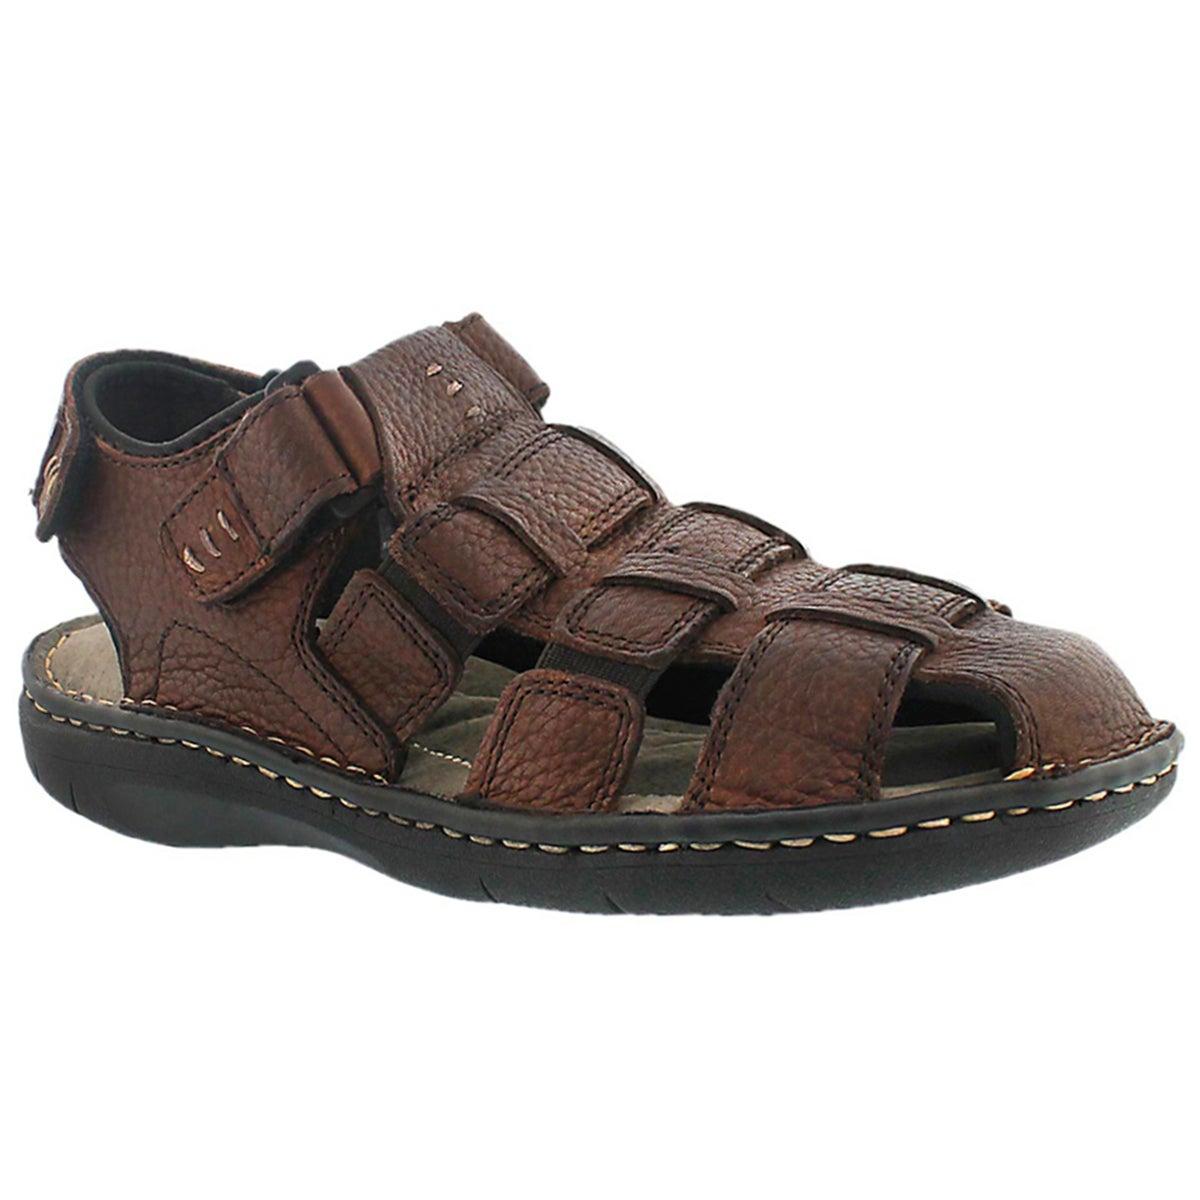 Mns Charles 3 brown fisherman sandal